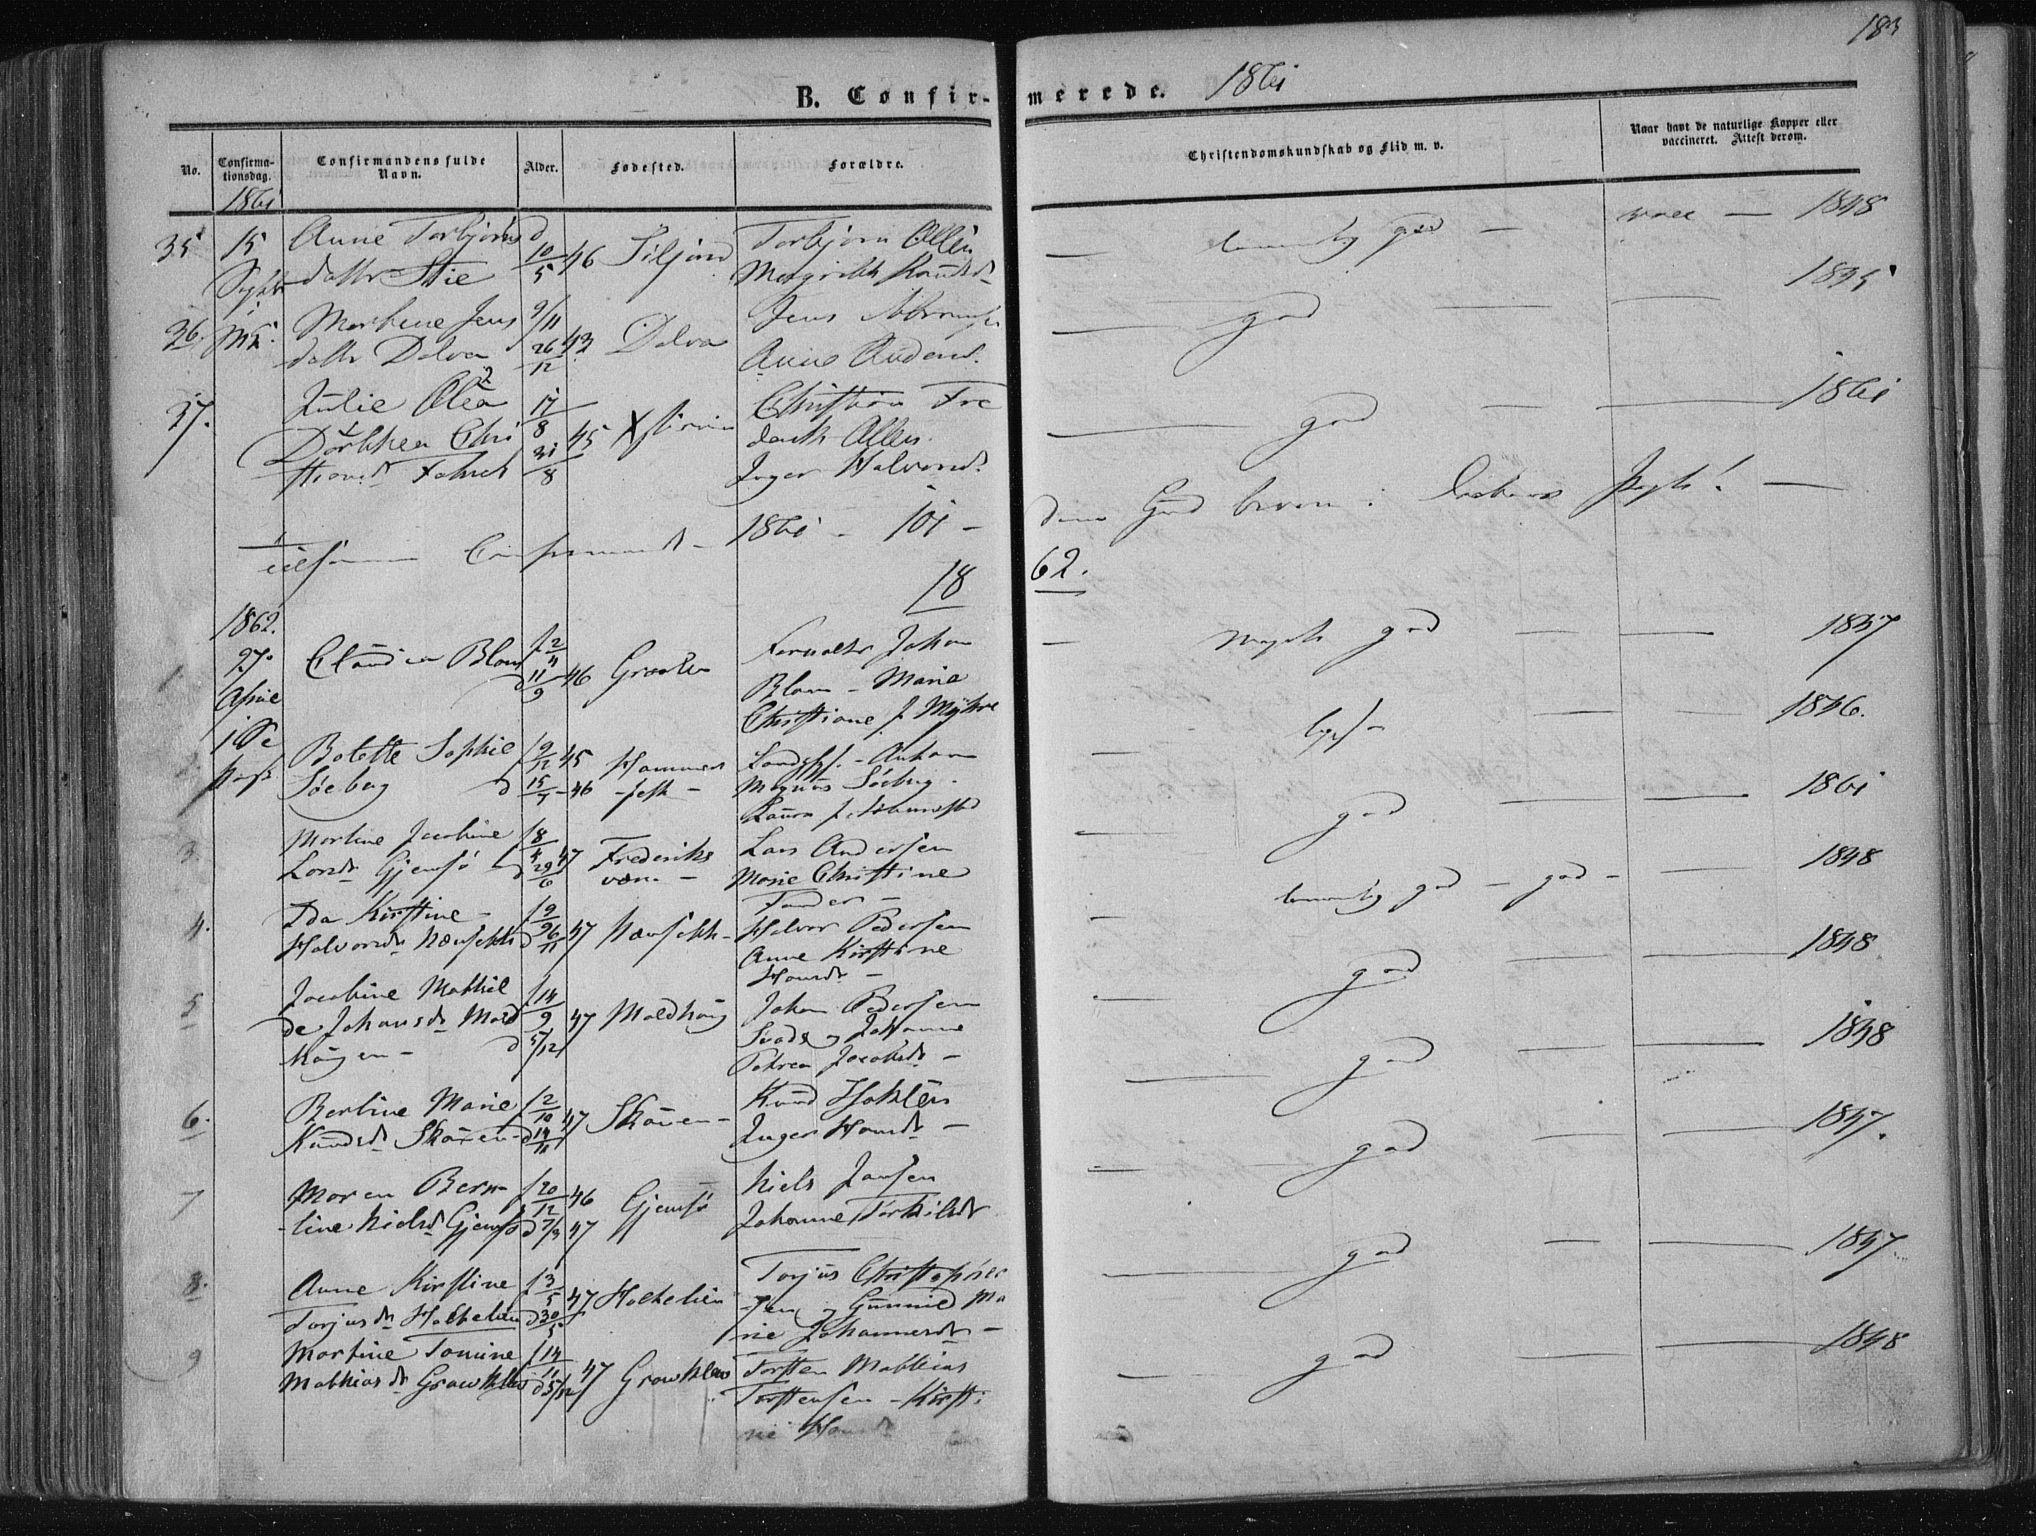 SAKO, Solum kirkebøker, F/Fa/L0007: Ministerialbok nr. I 7, 1856-1864, s. 183